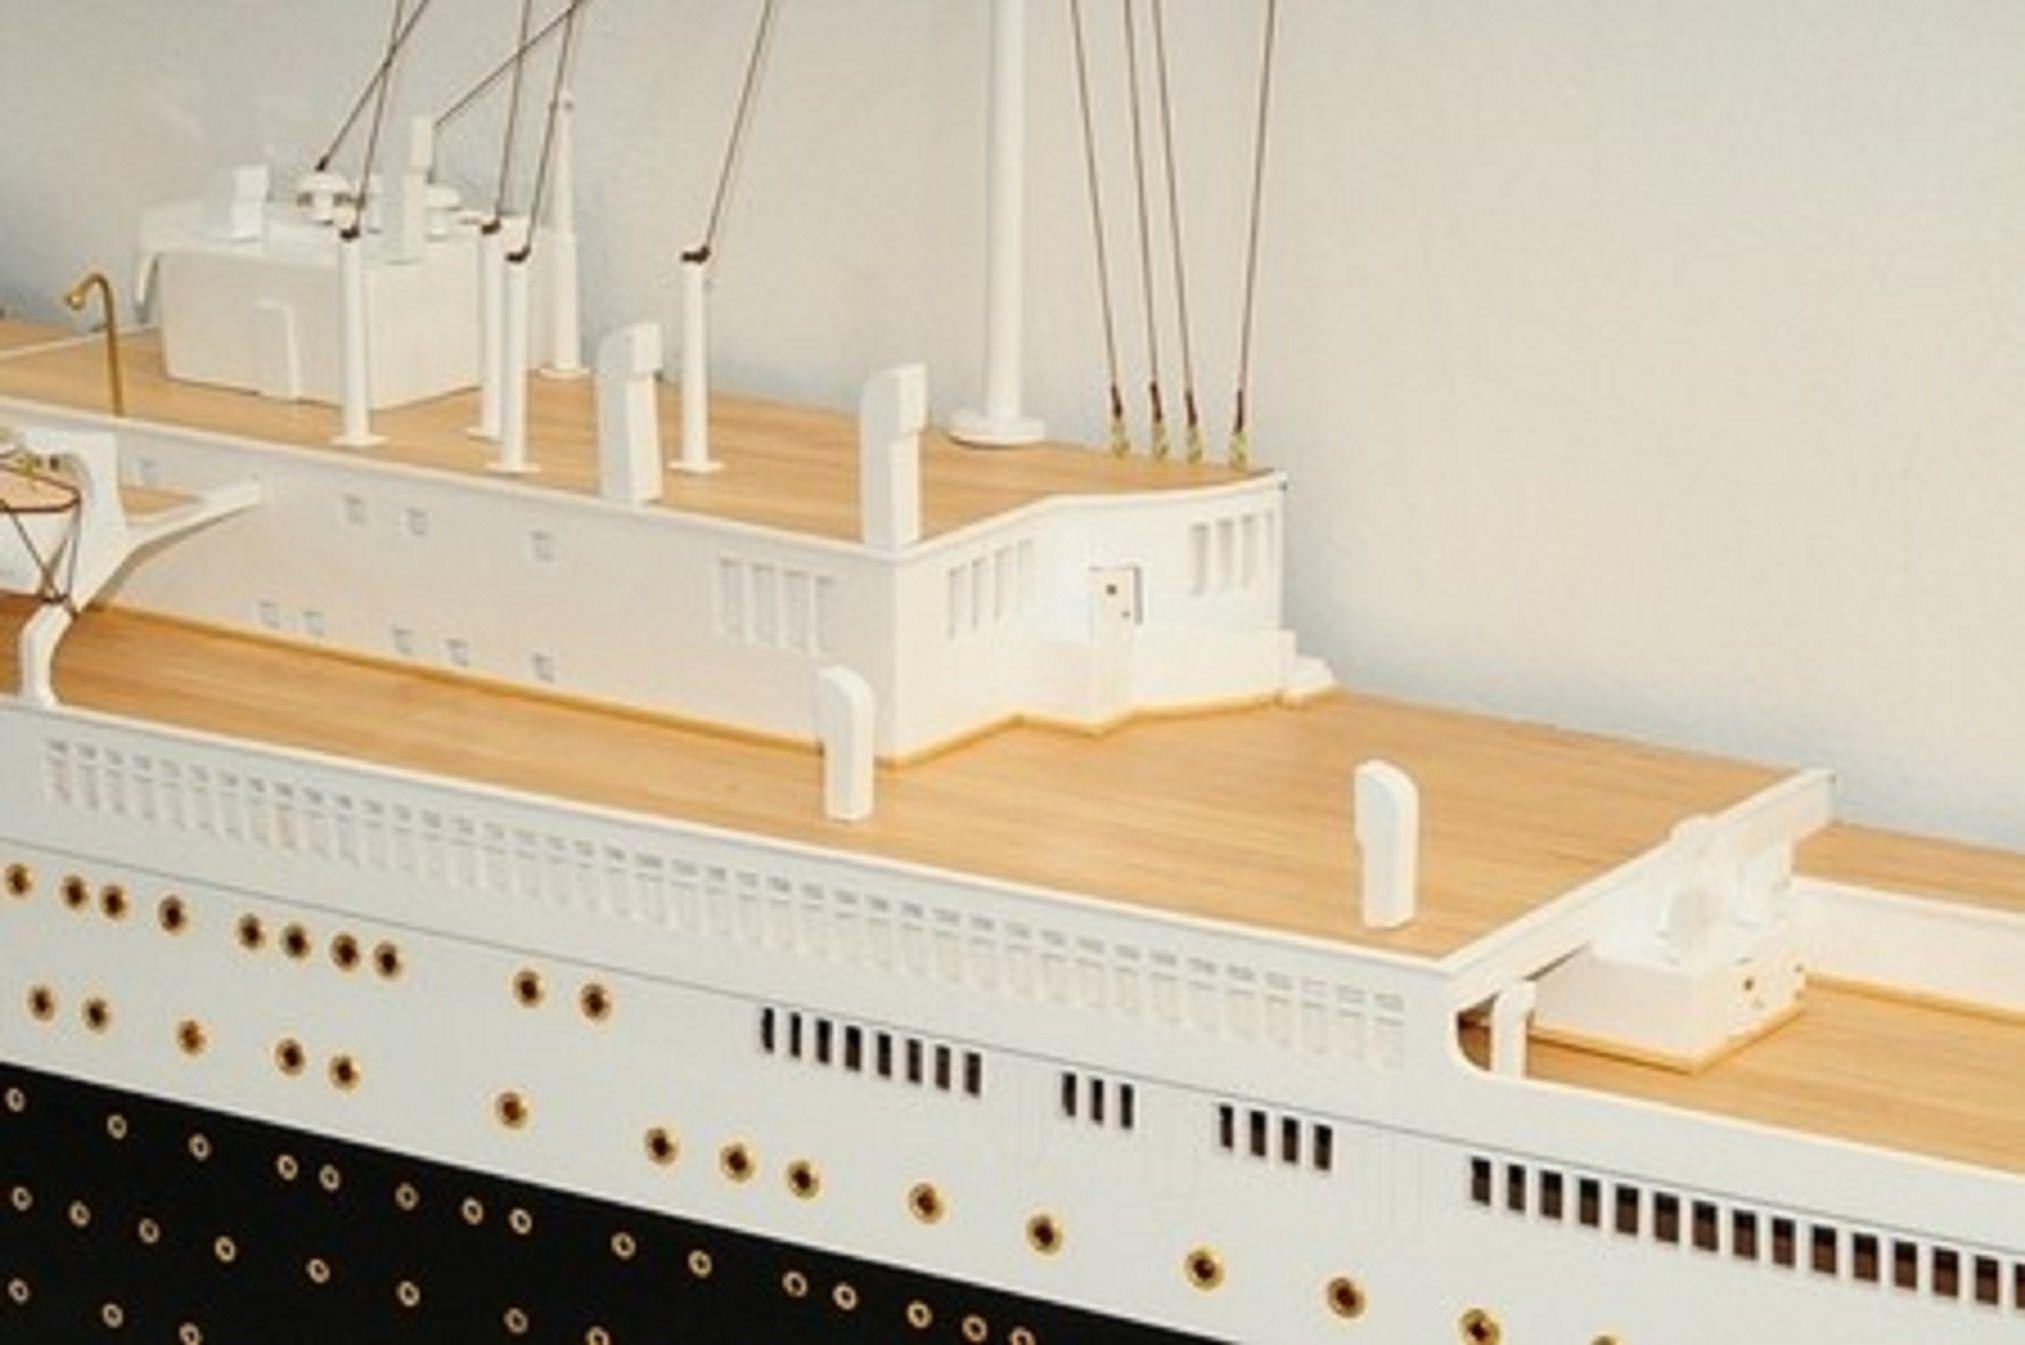 670-7591-RMS-Queen-Mary-Half-Model-Premier-Range